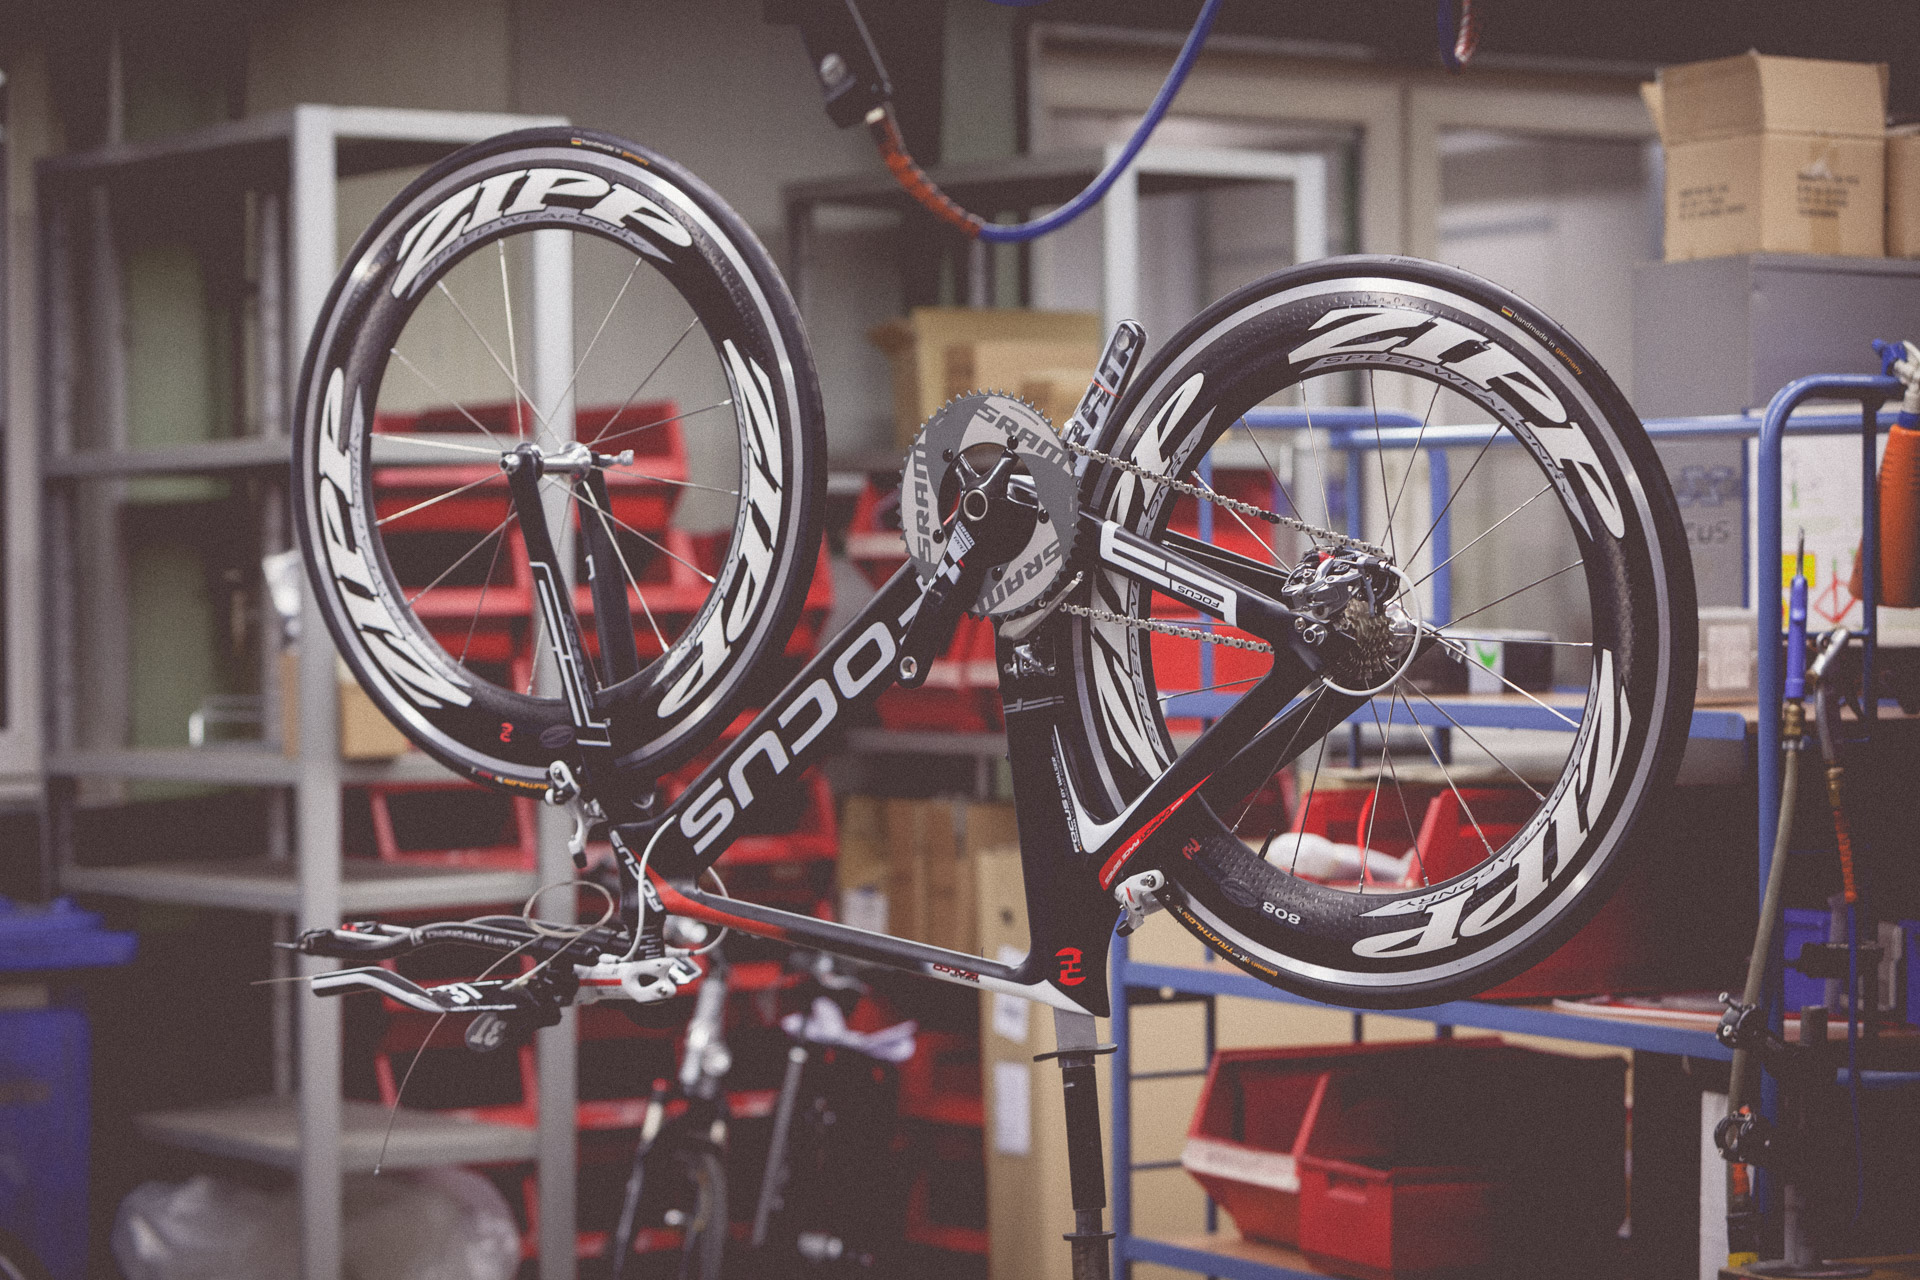 52-Derby-Cycle-Werke-Fahrradproduktion